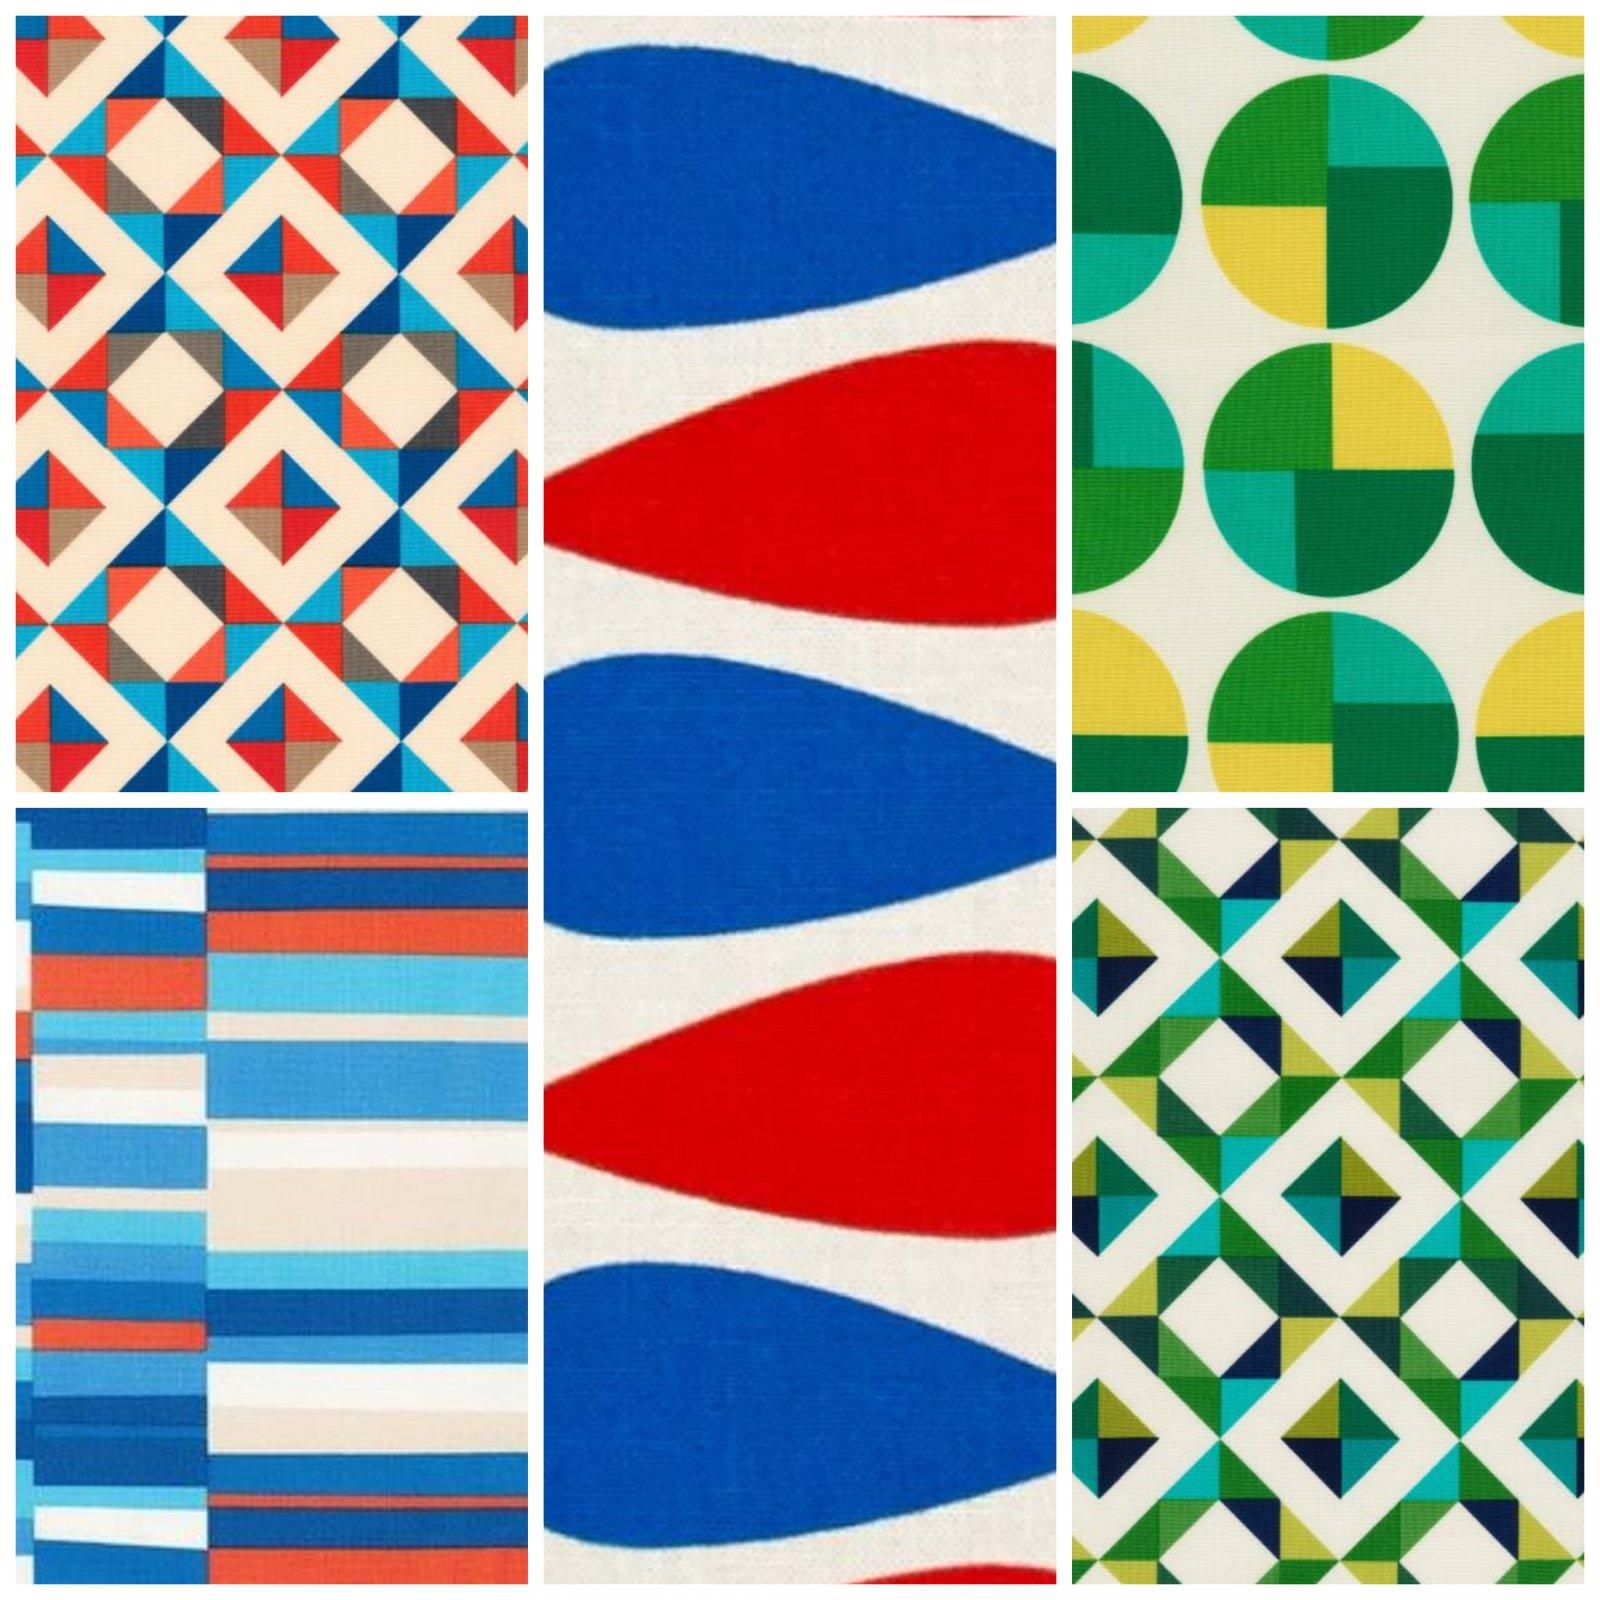 Fat Quarter Bundle Bright Geo Pop Canvas 12pcs/bundle - Robert Kaufman Fabrics